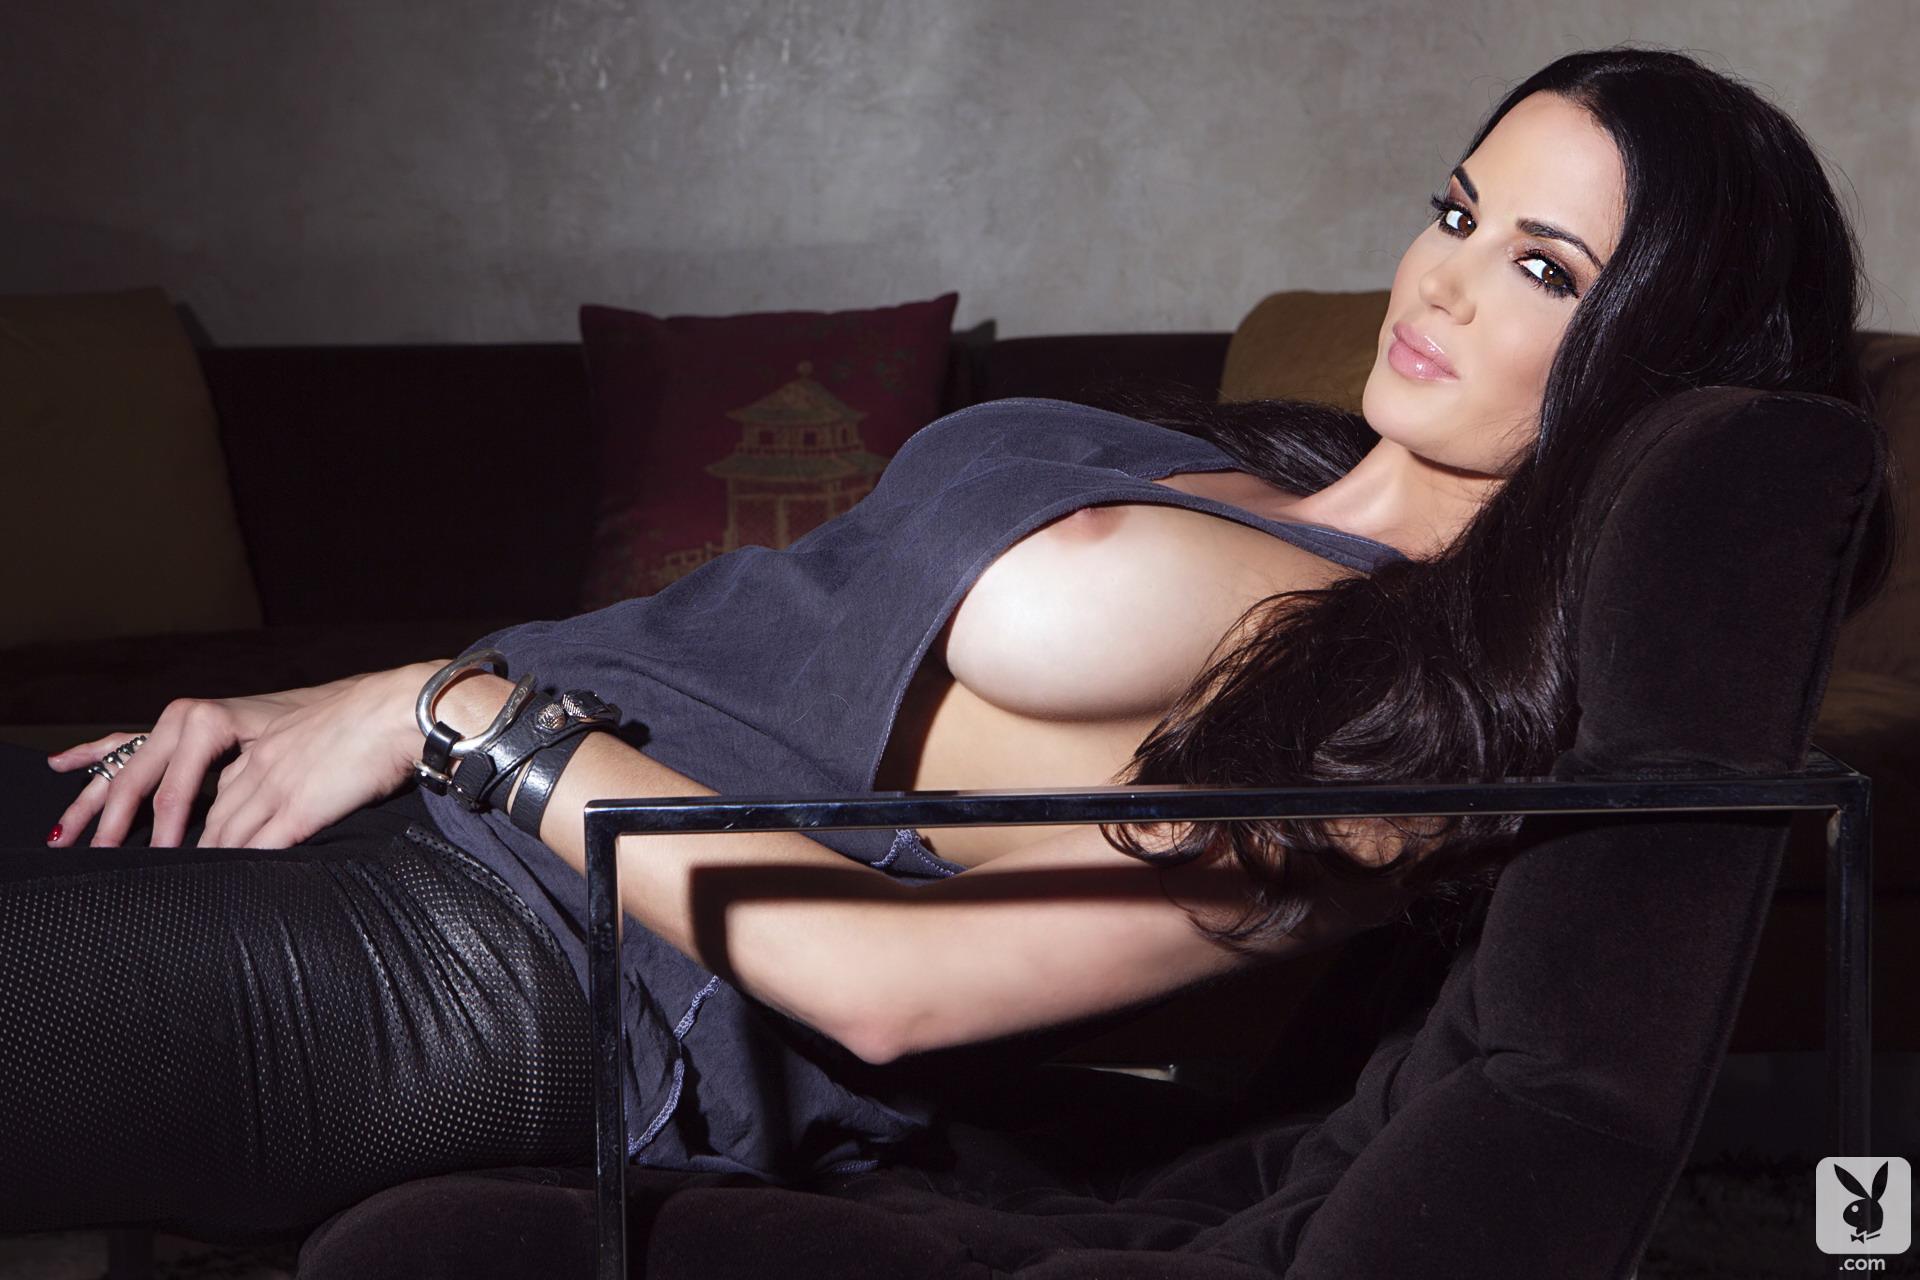 Playboy playmate beth williams nude